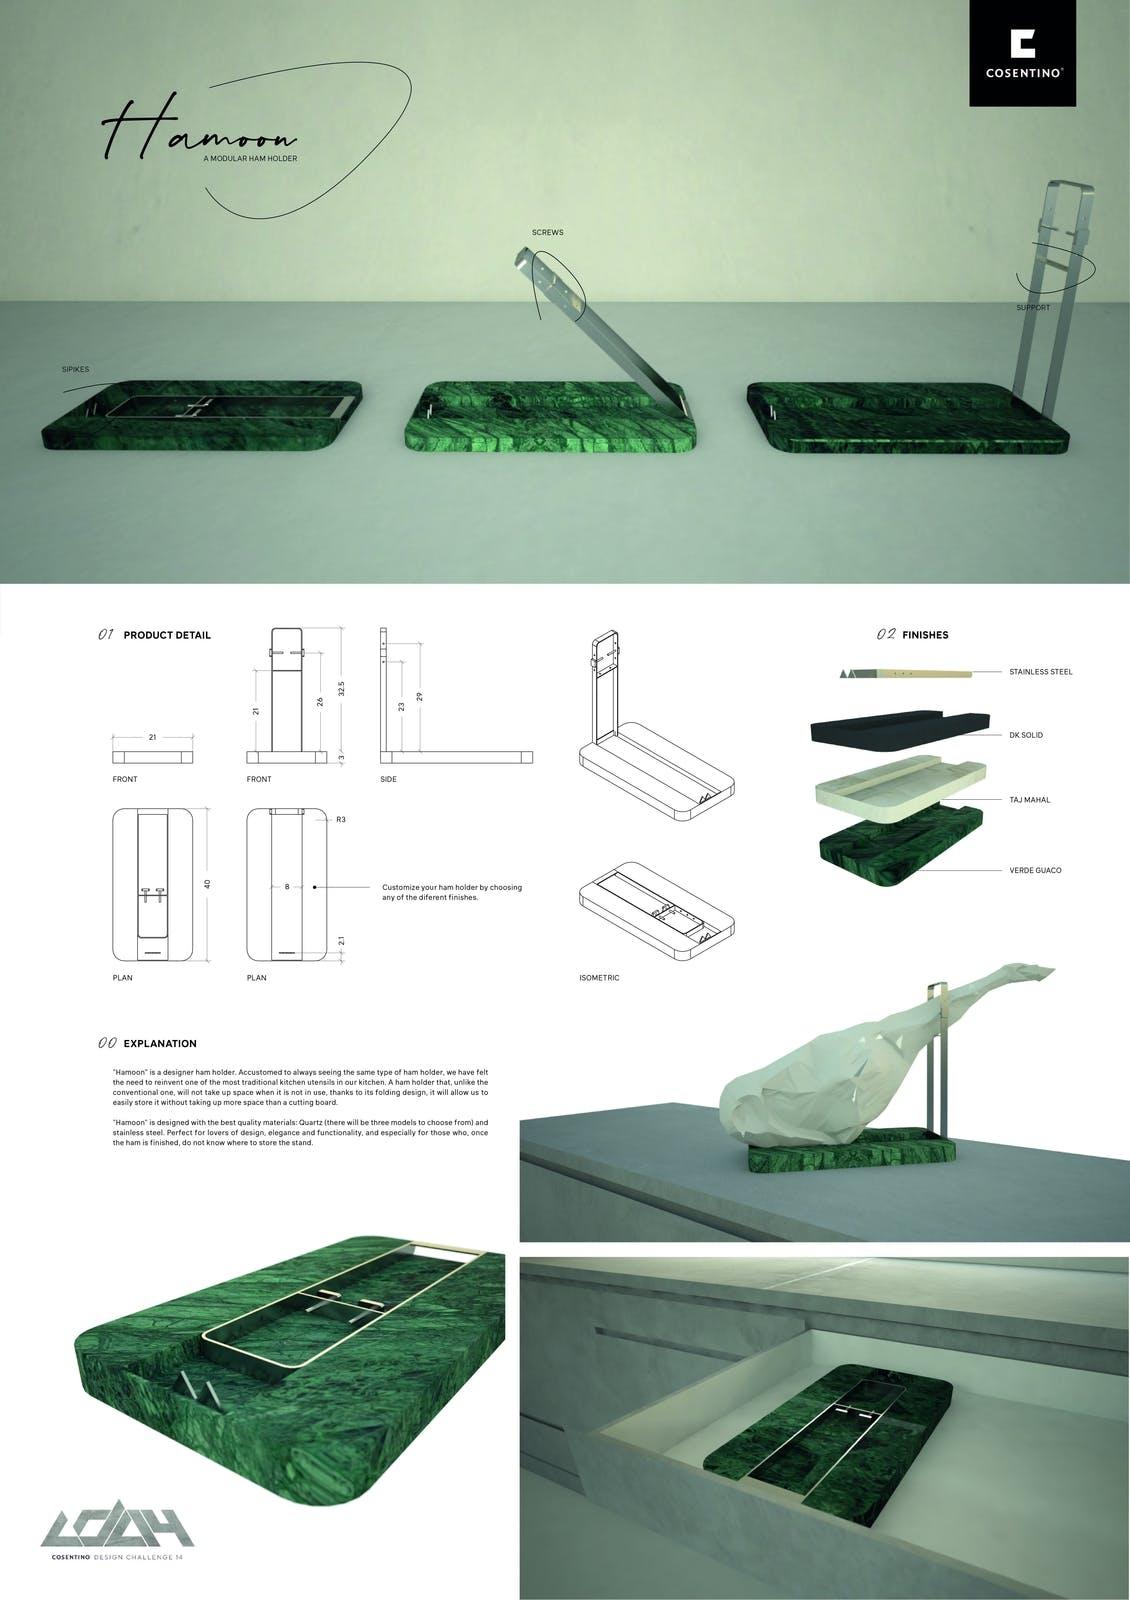 Image of 053 Hamoon s 1 in Ganadores Cosentino Design Challenge 14 - Cosentino